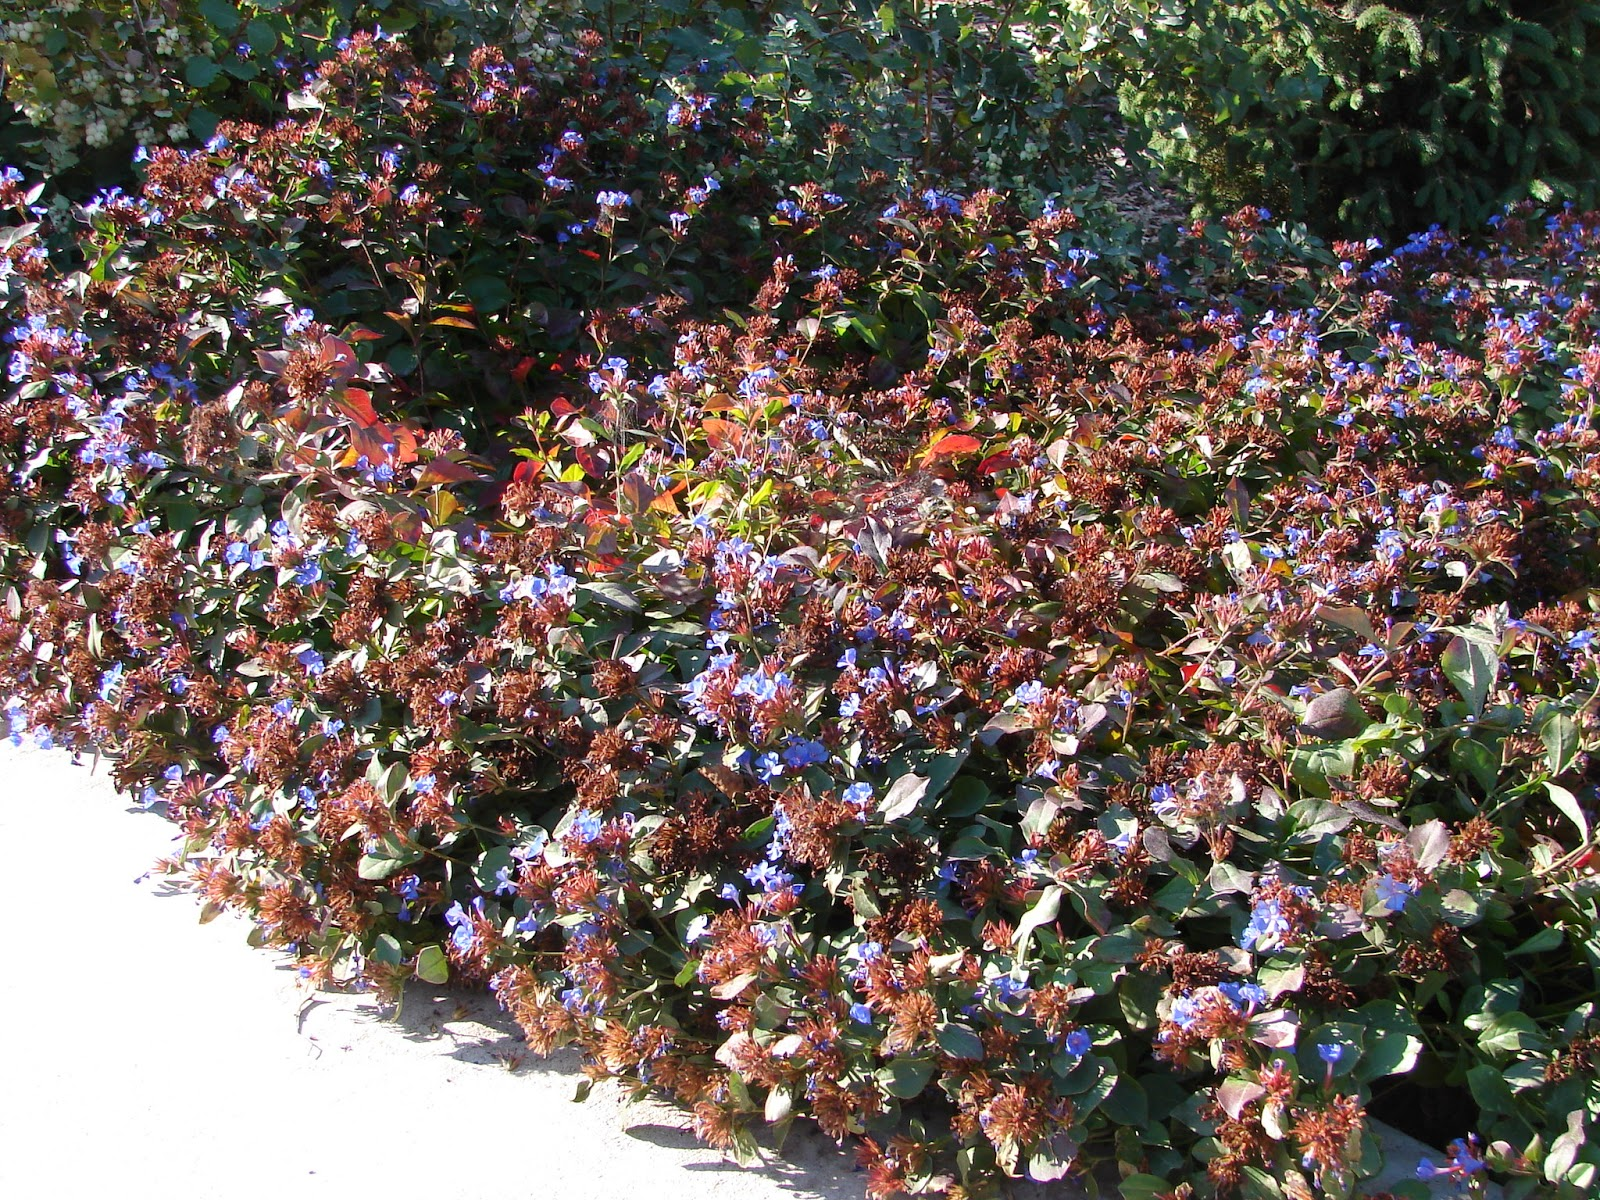 new utah gardener blue plumbago  ceratostigma plumbaginoides, Natural flower